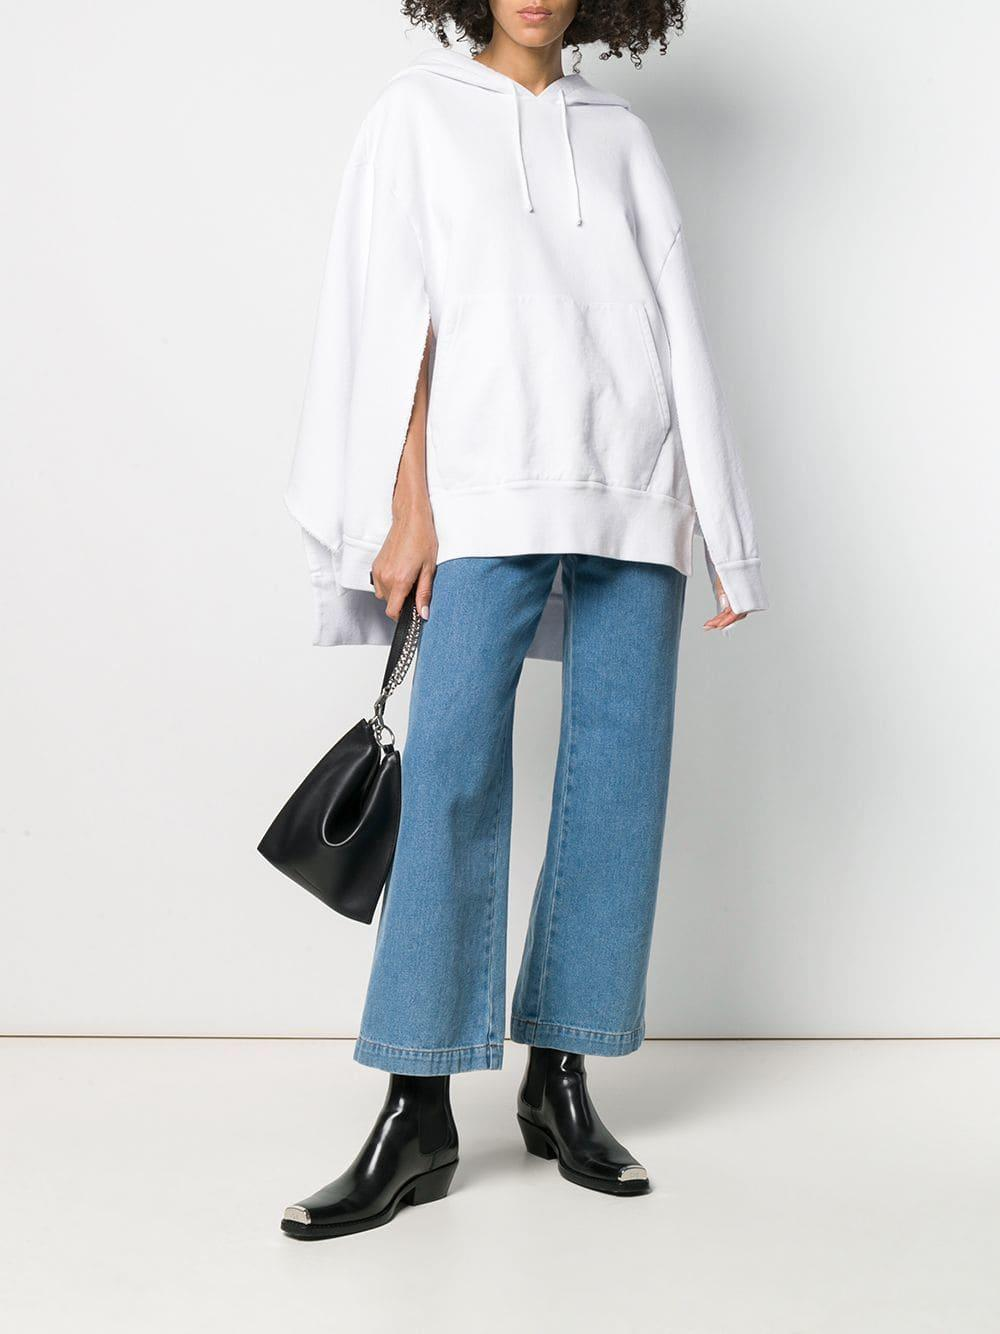 Sudadera oversize estilo capa Maison Margiela de color Blanco